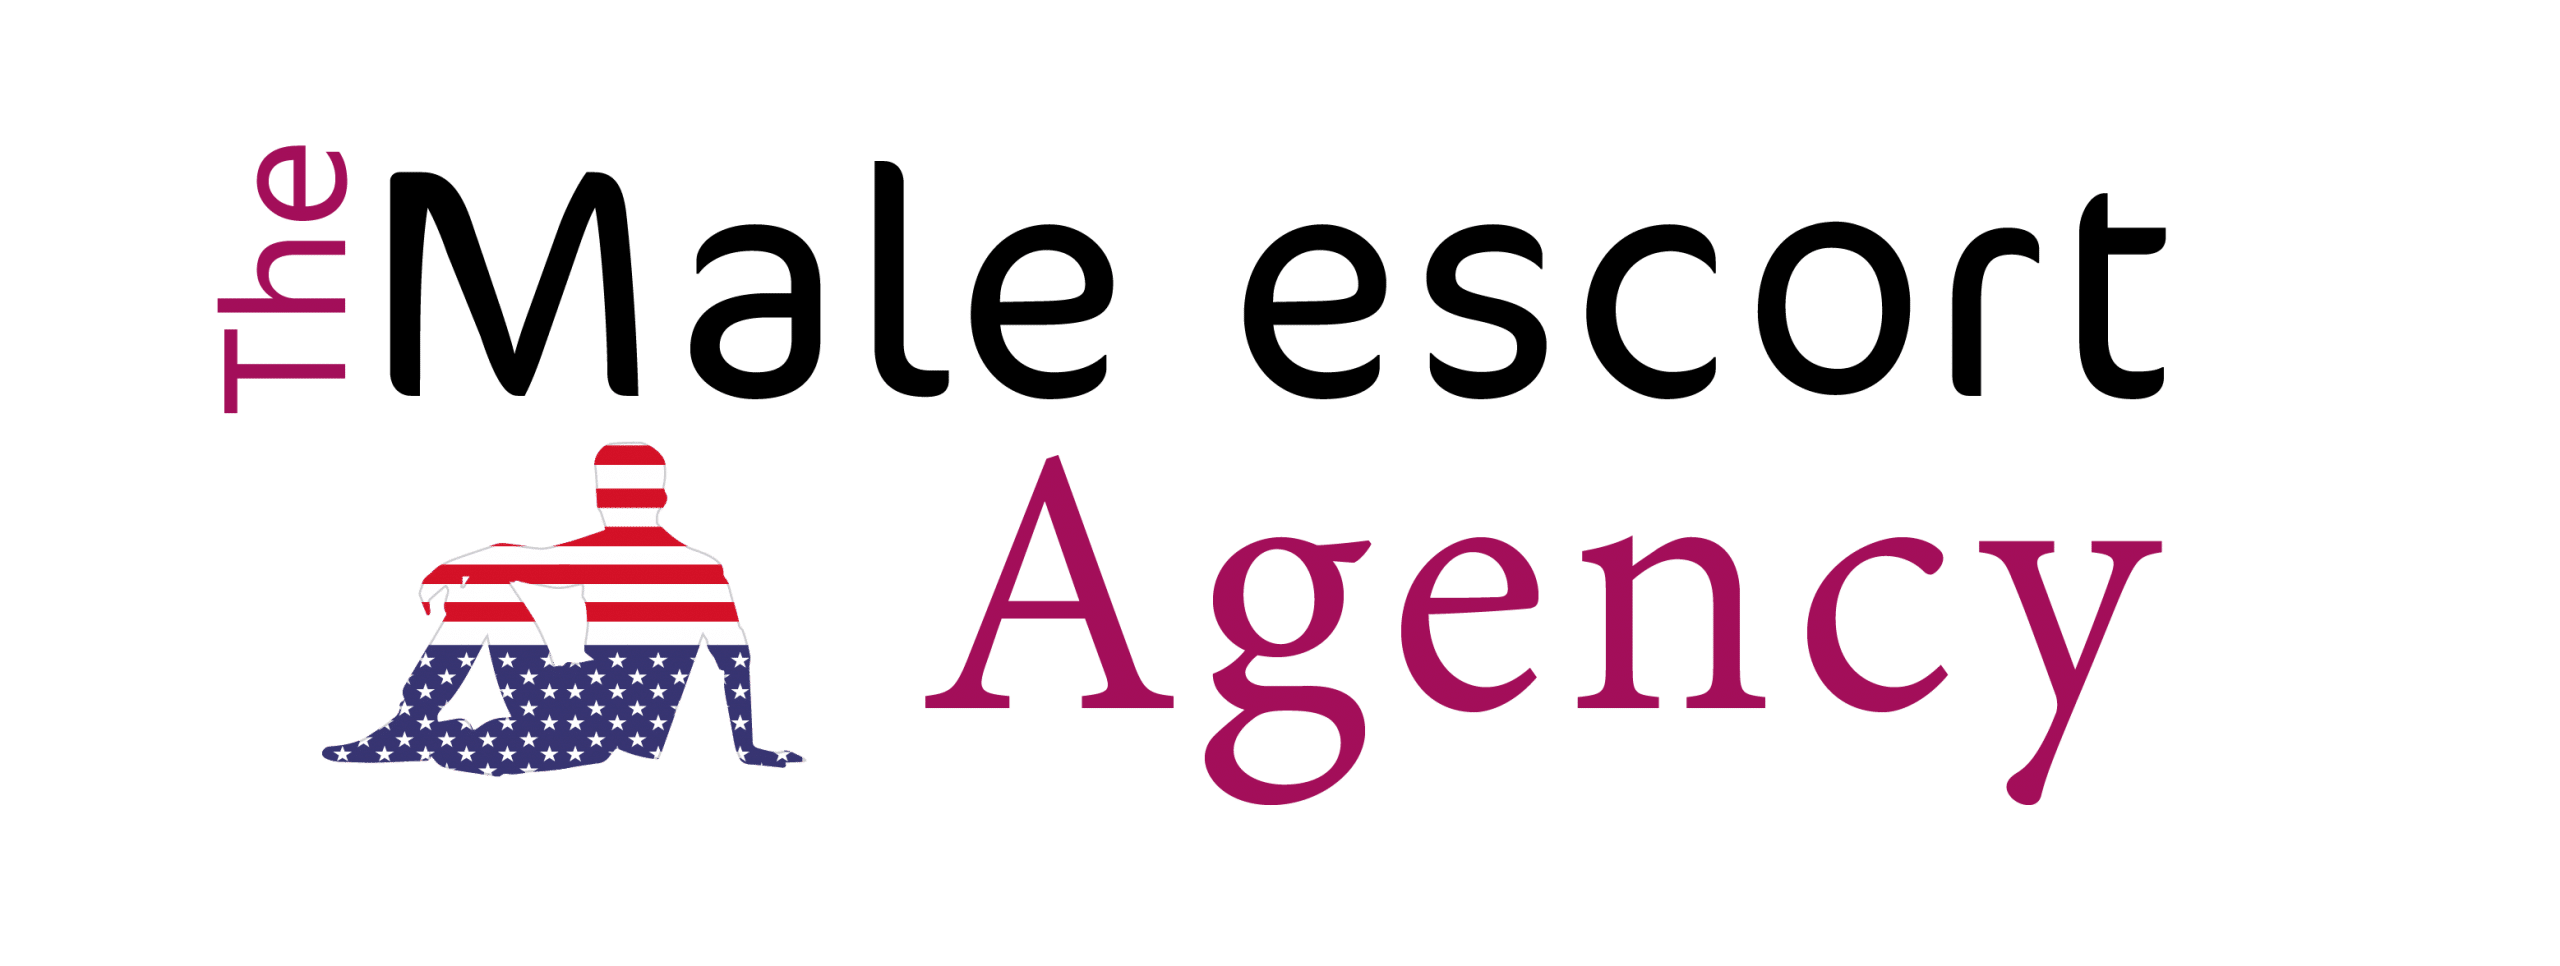 male escort agency USA